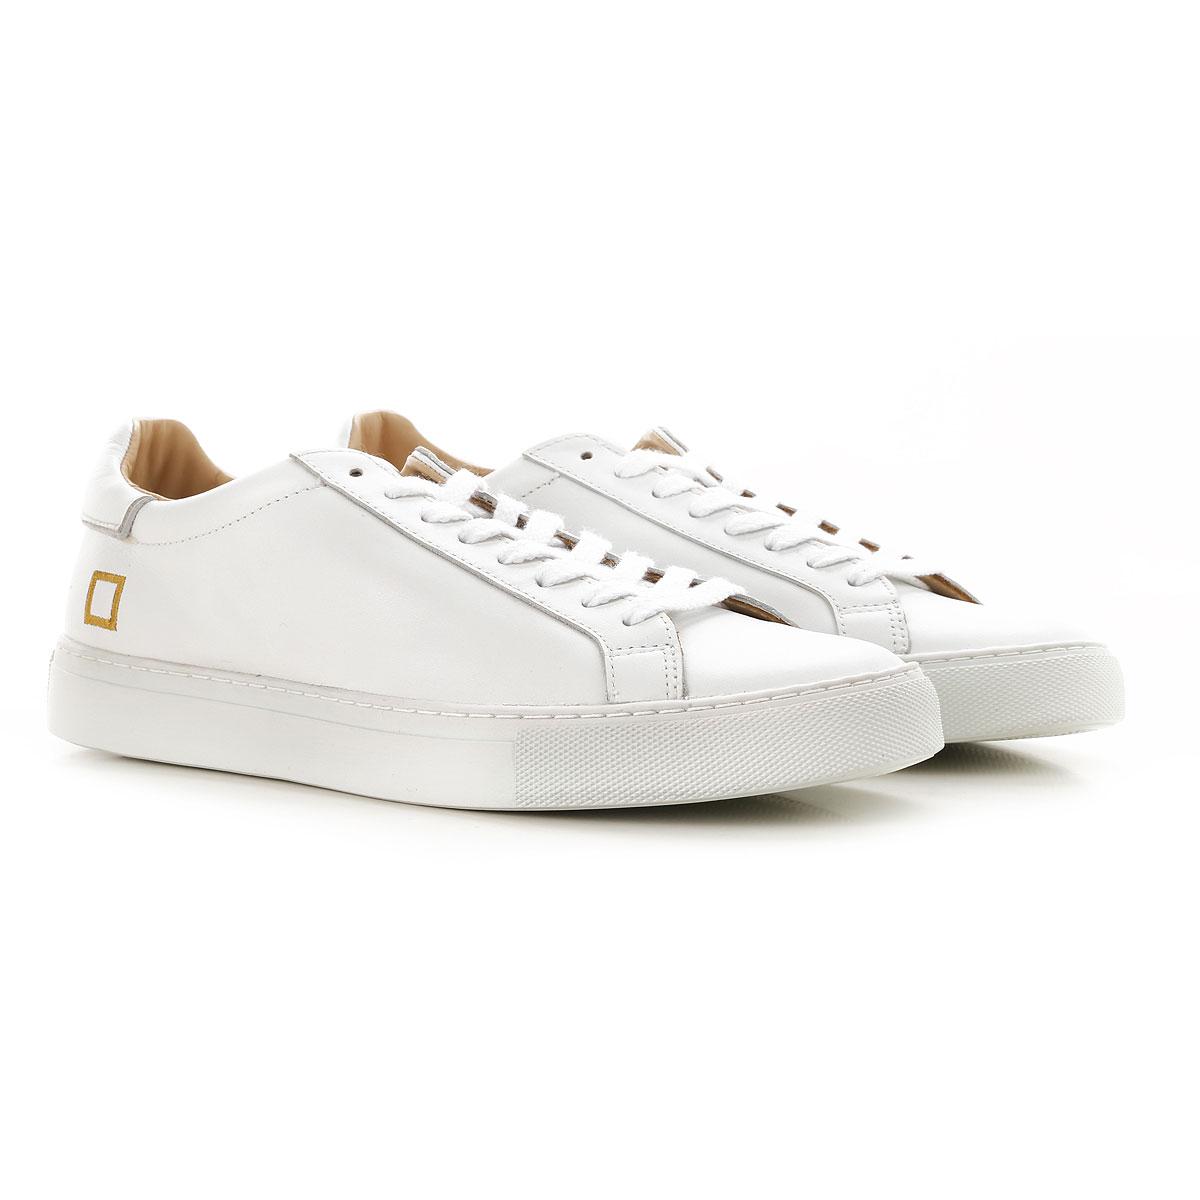 Image of D.A.T.E. Sneakers for Men, White, Leather, 2017, US 8 - EU 41 - UK 7 - JP 26.5 US 9 - EU 42 - UK 8 - JP 27 US 10 - EU 43 - UK 9 - JP 27.5 US 11 - EU 44 - UK 10 - JP 28 US 12 - EU 45 - UK 11 - JP 28.5